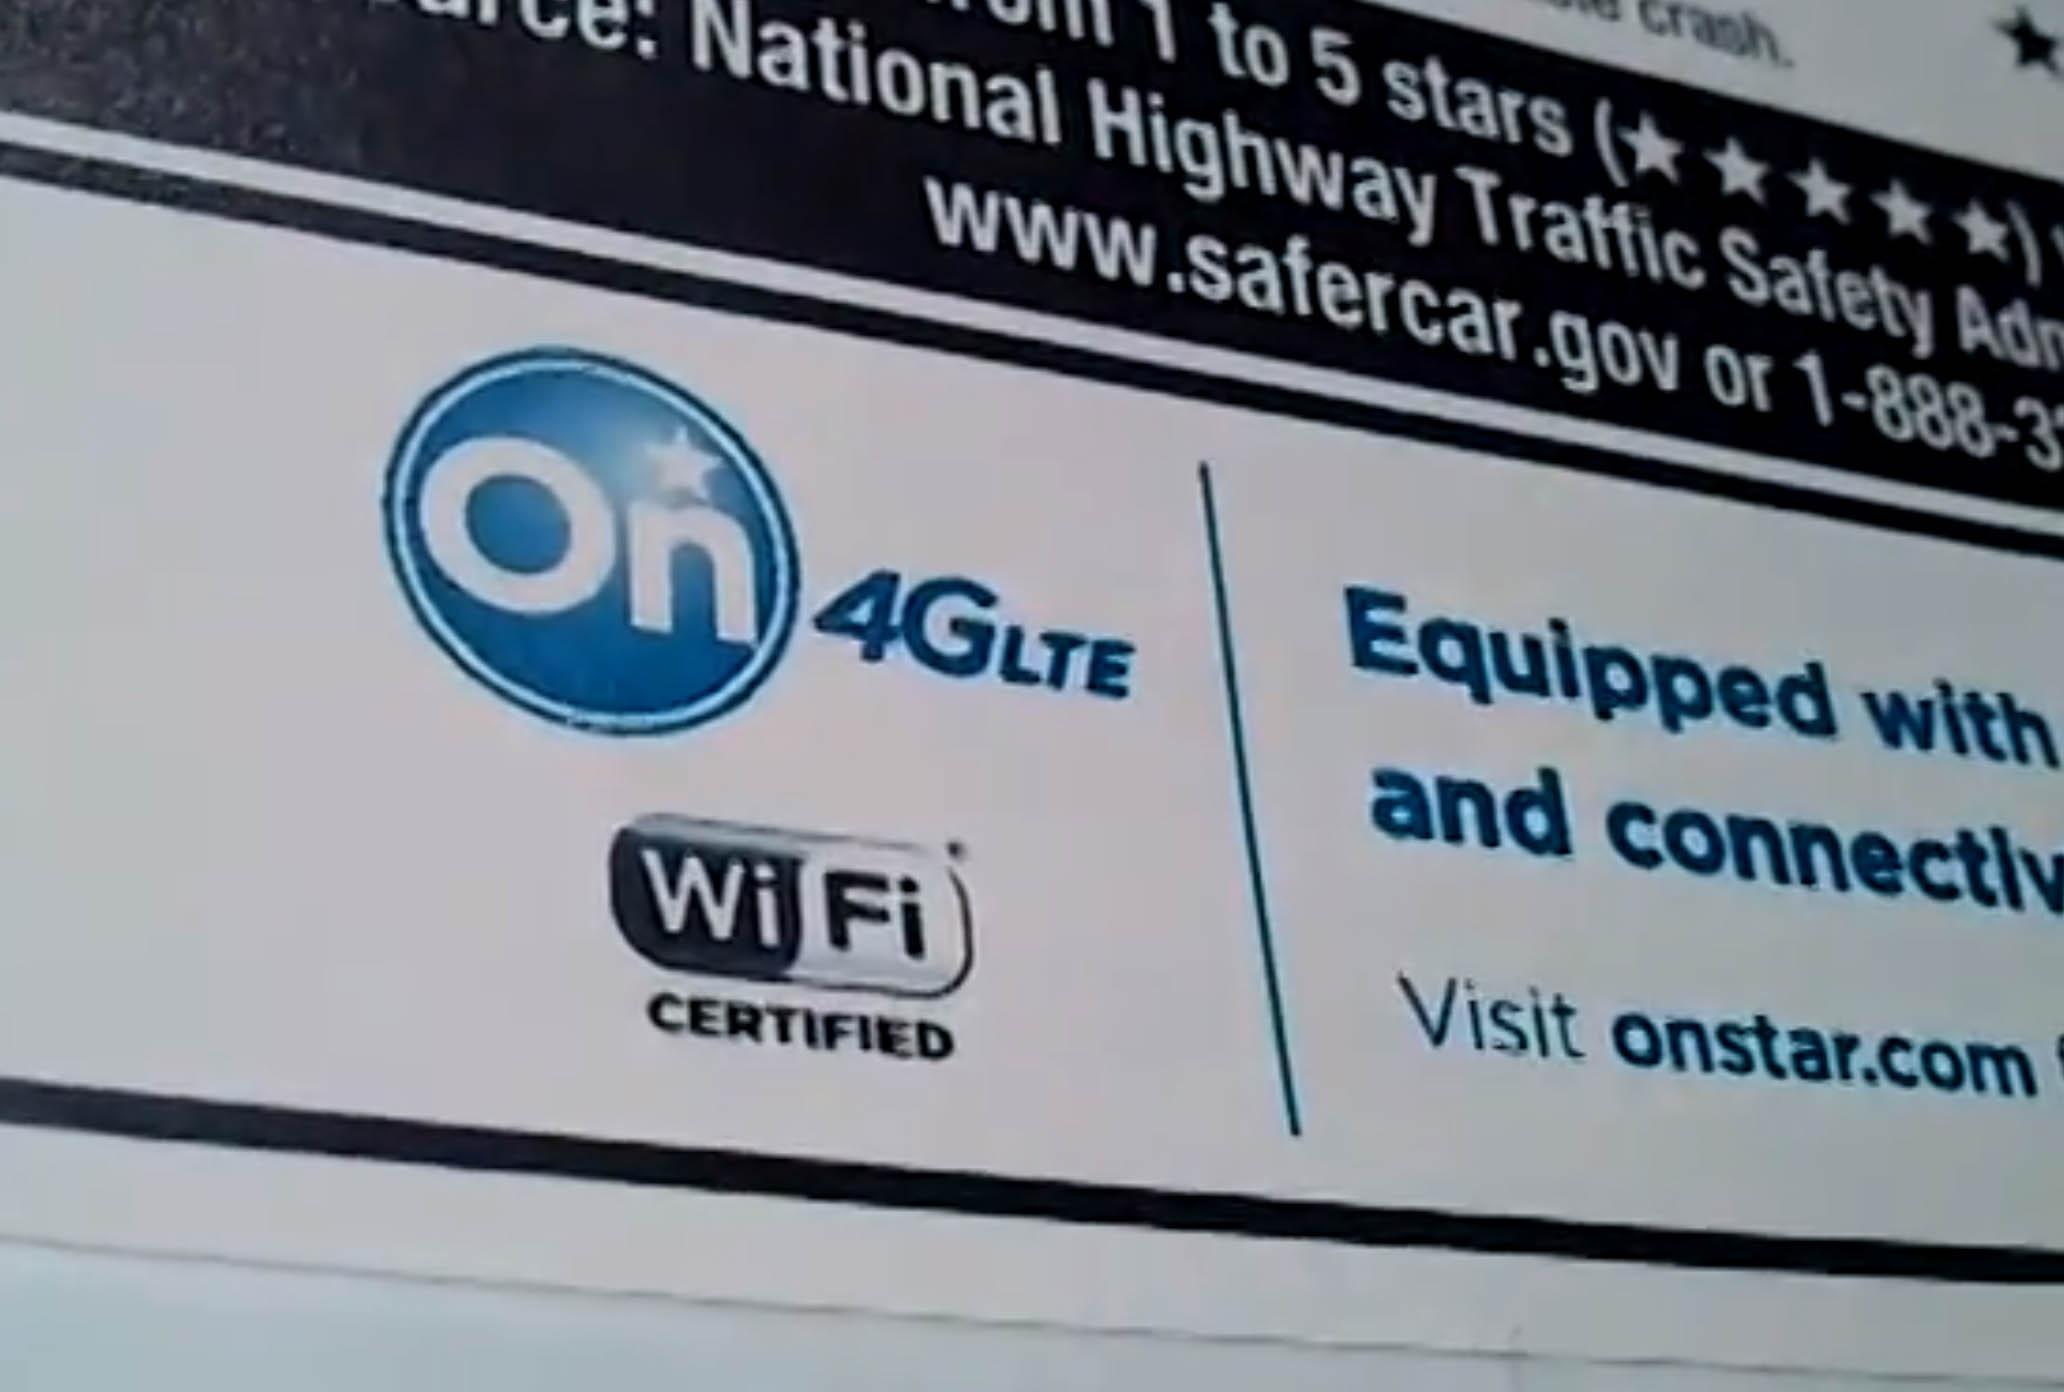 wifi in cars trucks emr health alliance of bc. Black Bedroom Furniture Sets. Home Design Ideas